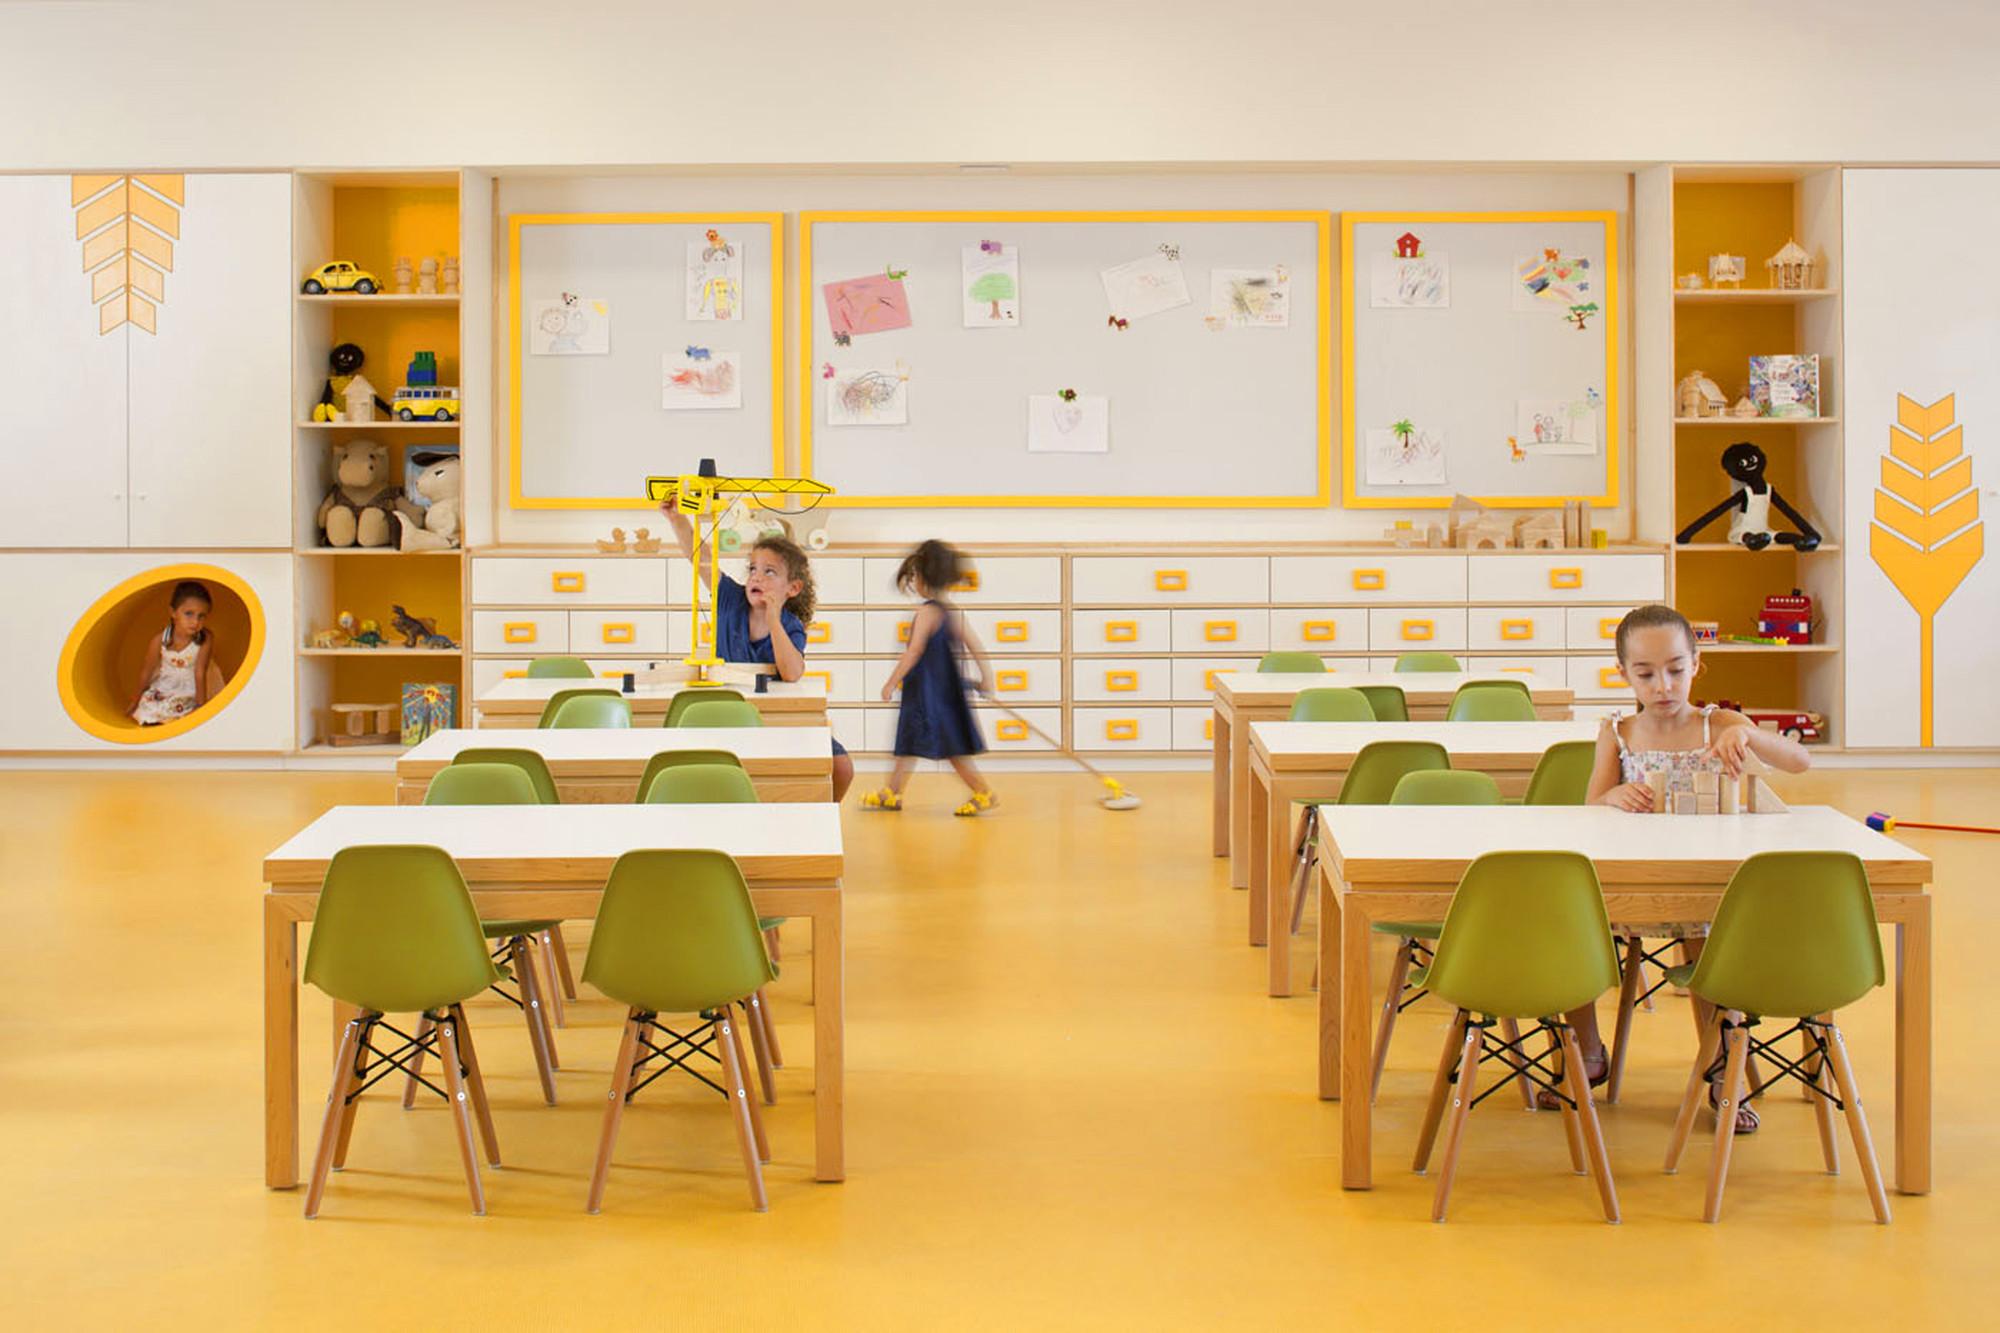 Modern Classroom For Kids ~ Kfar shemaryahu kindergarden sarit shani hay archdaily